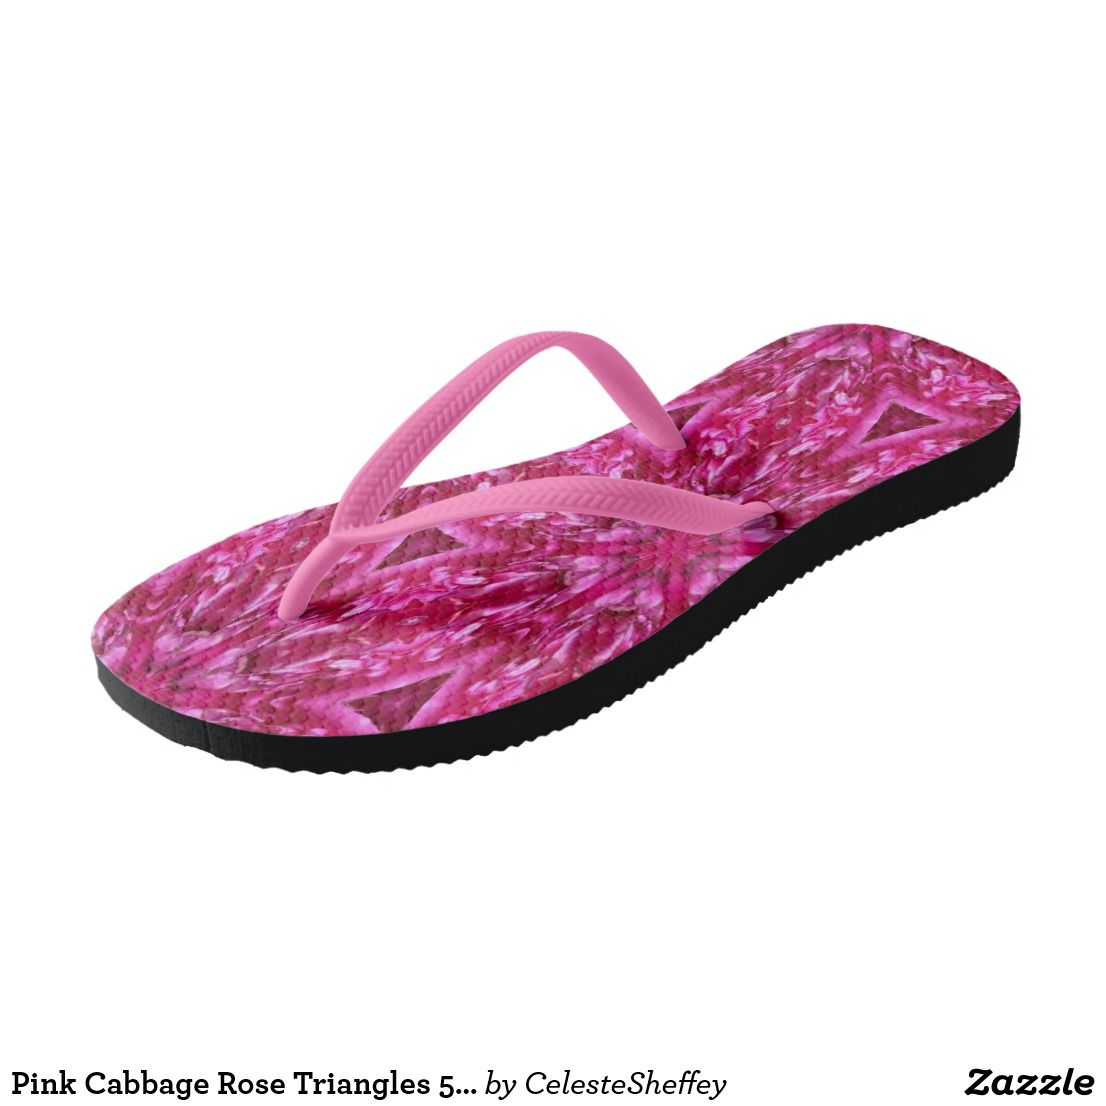 Pink Cabbage Rose Triangles 5072 Flip Flops